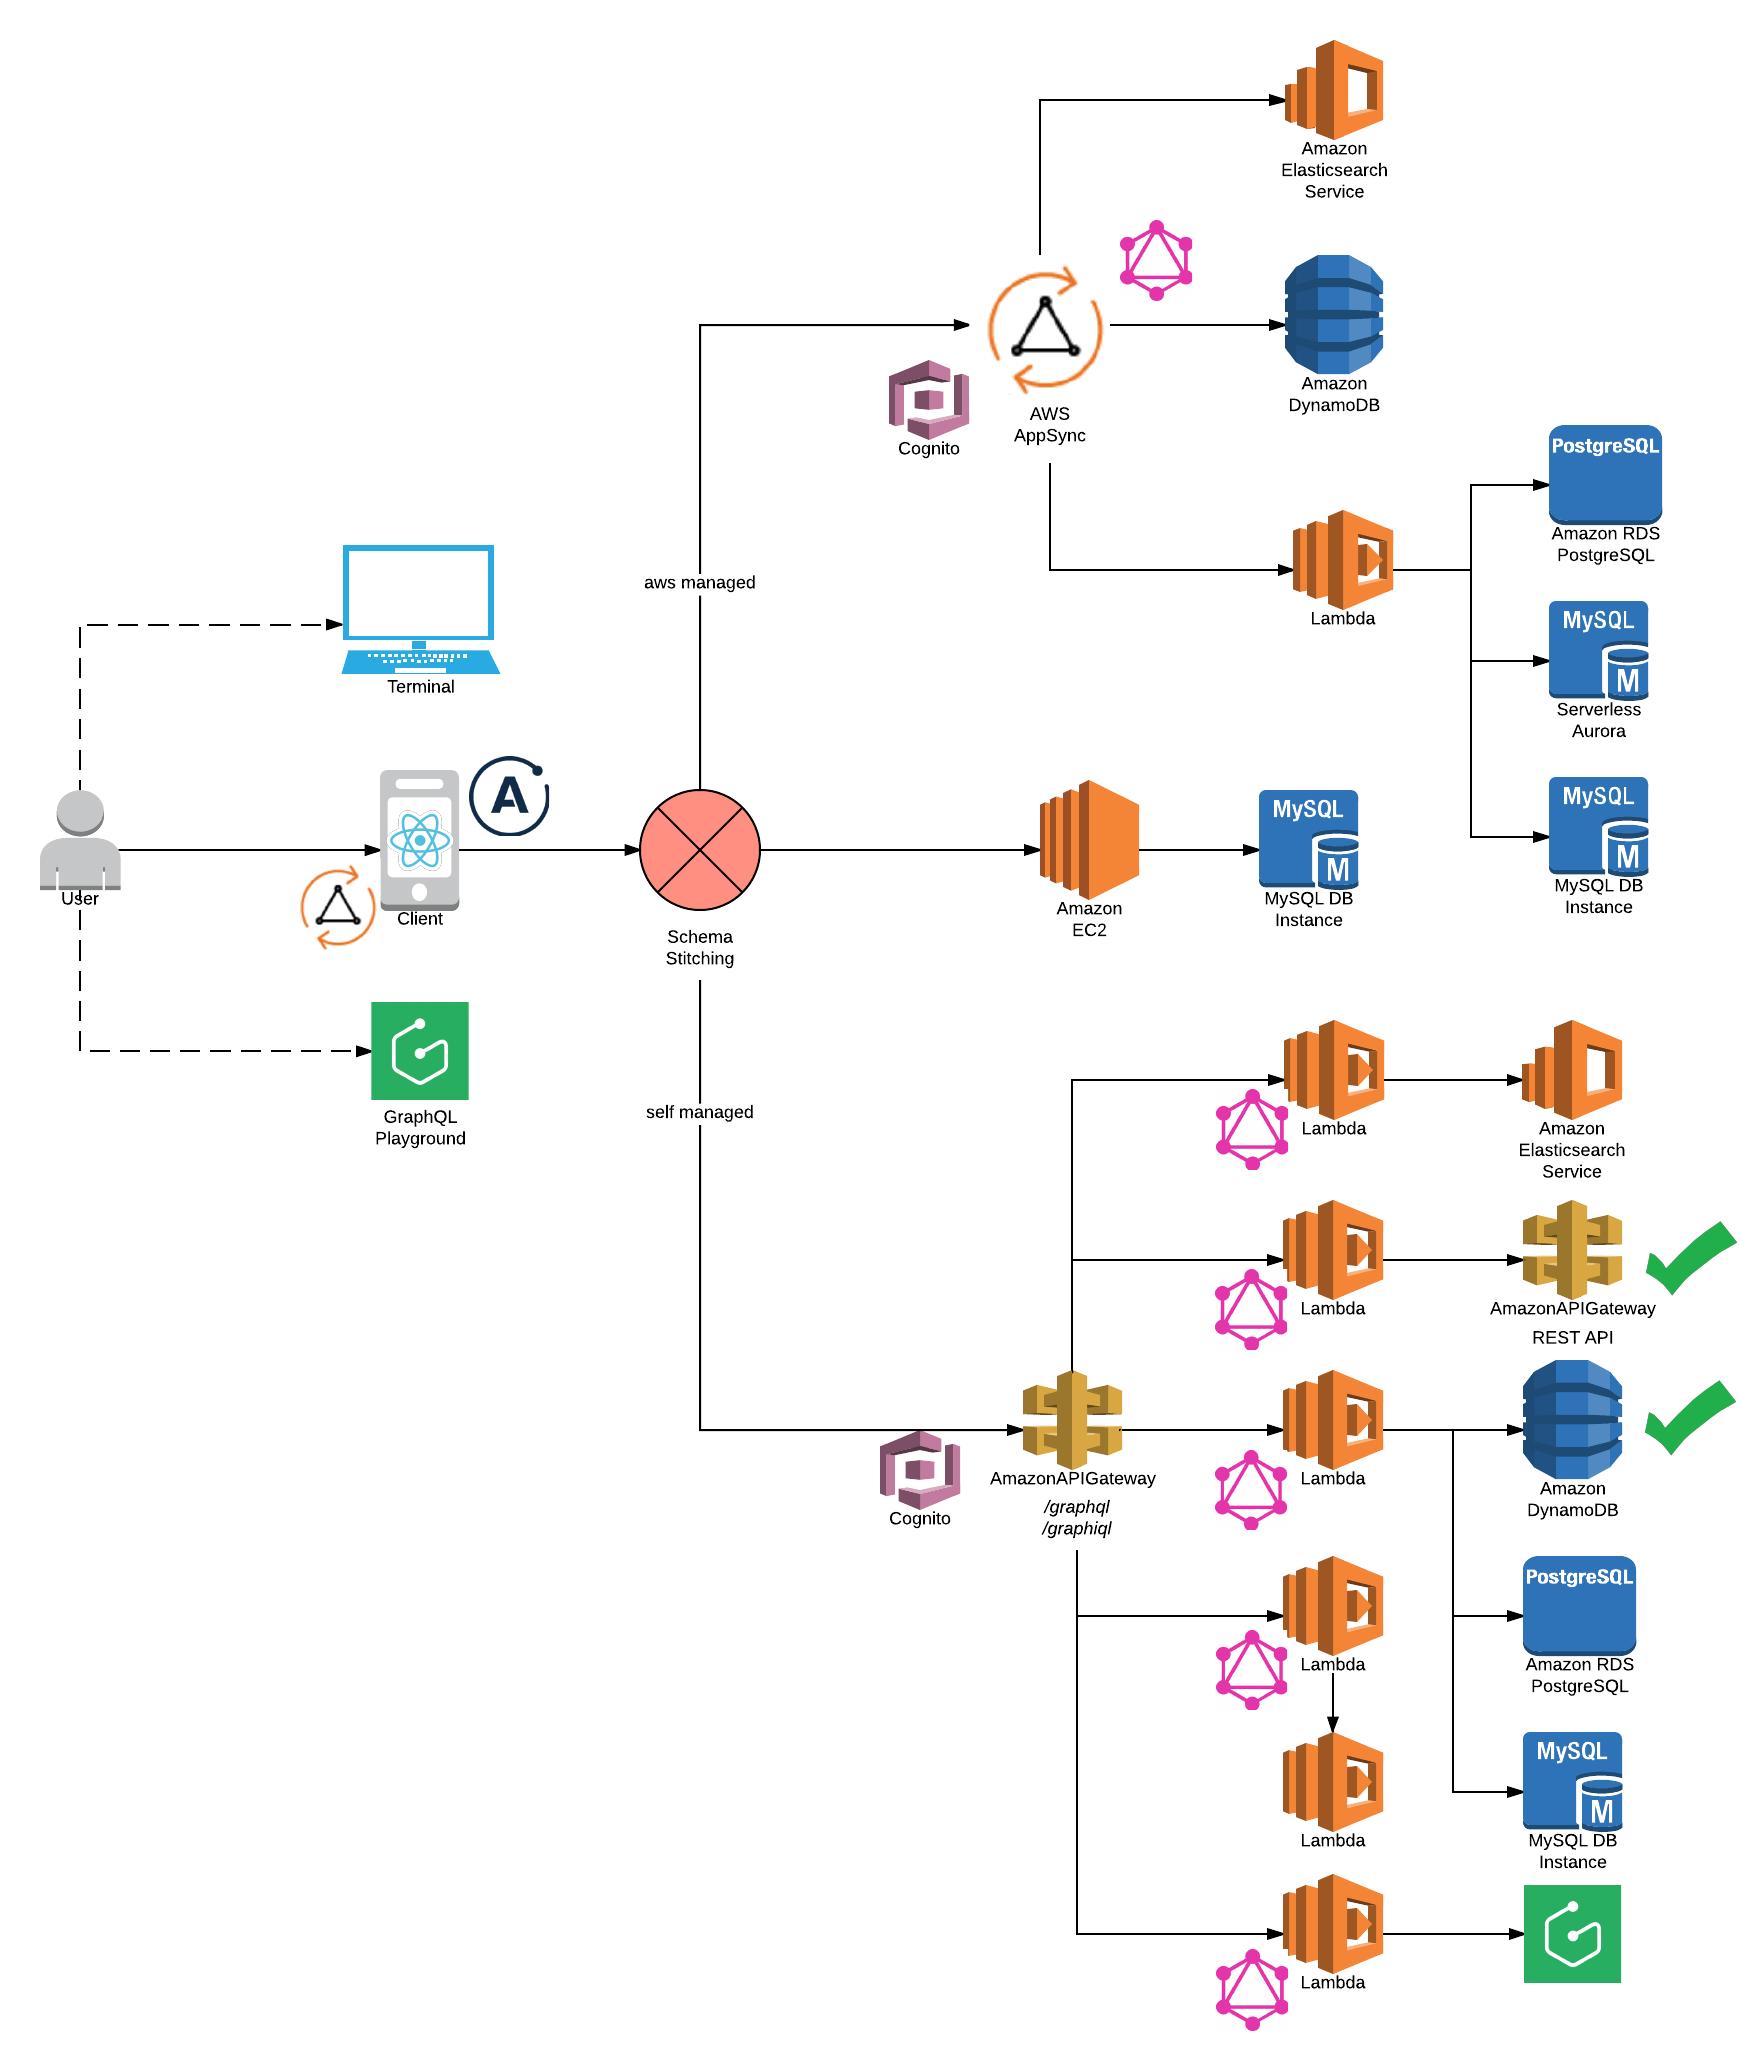 JstnEdr/serverless-graphql-apollo - Libraries io